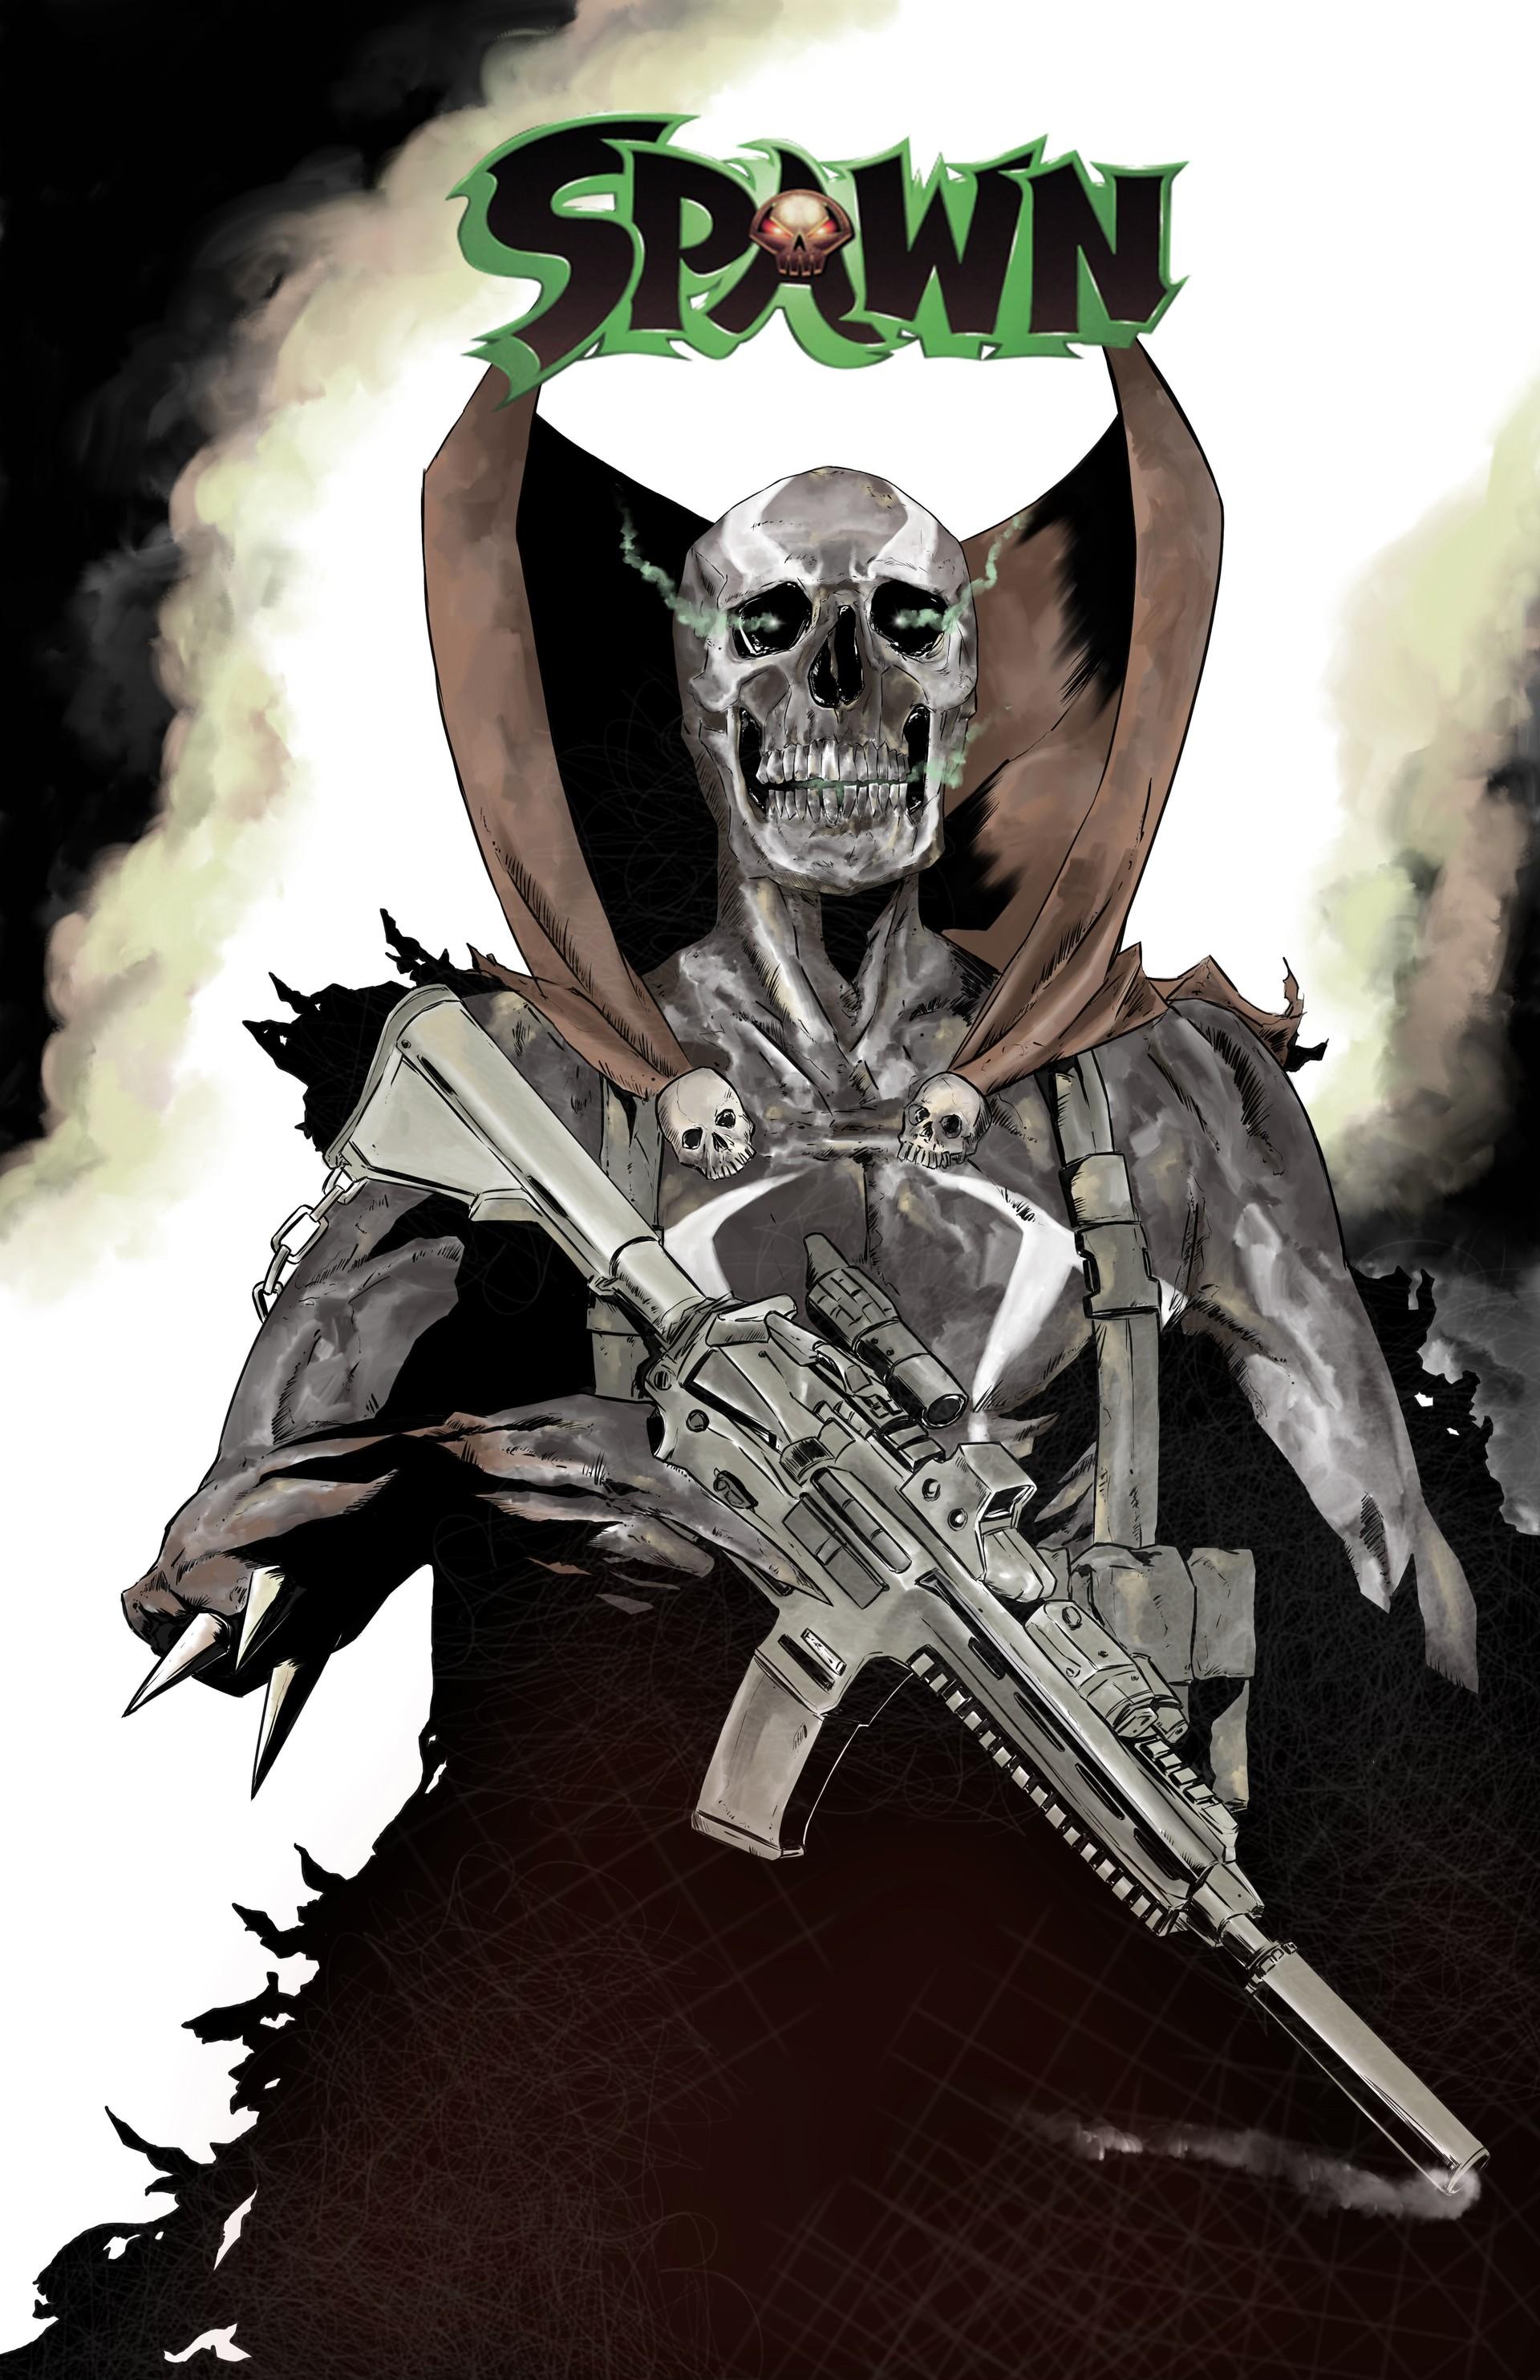 Manuel herrera araya spawn cover image